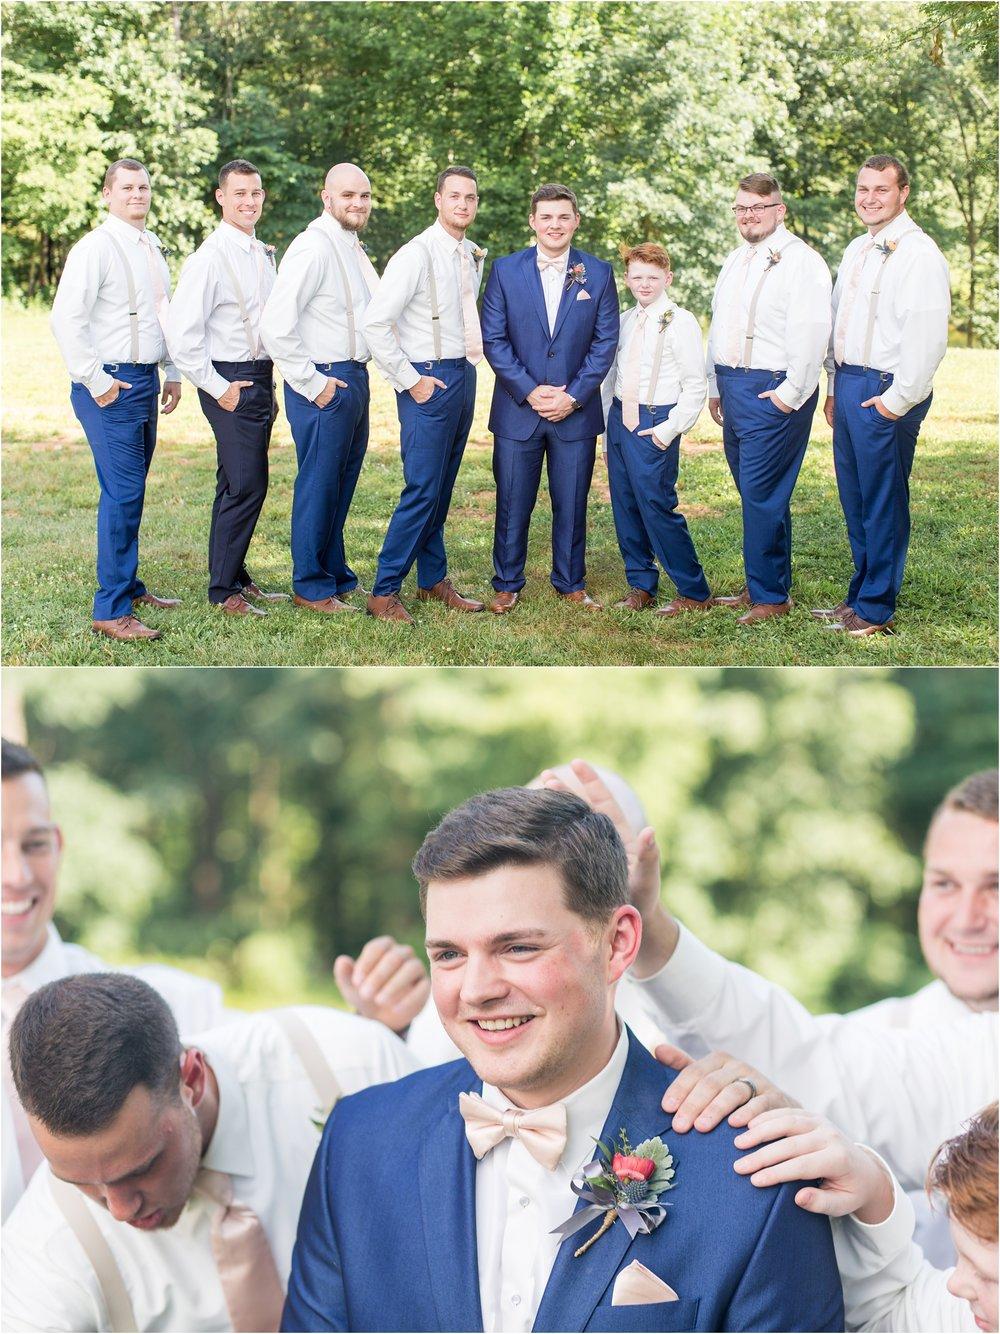 Savannah Eve Photography- Phillips Wedding- Blog-32.jpg